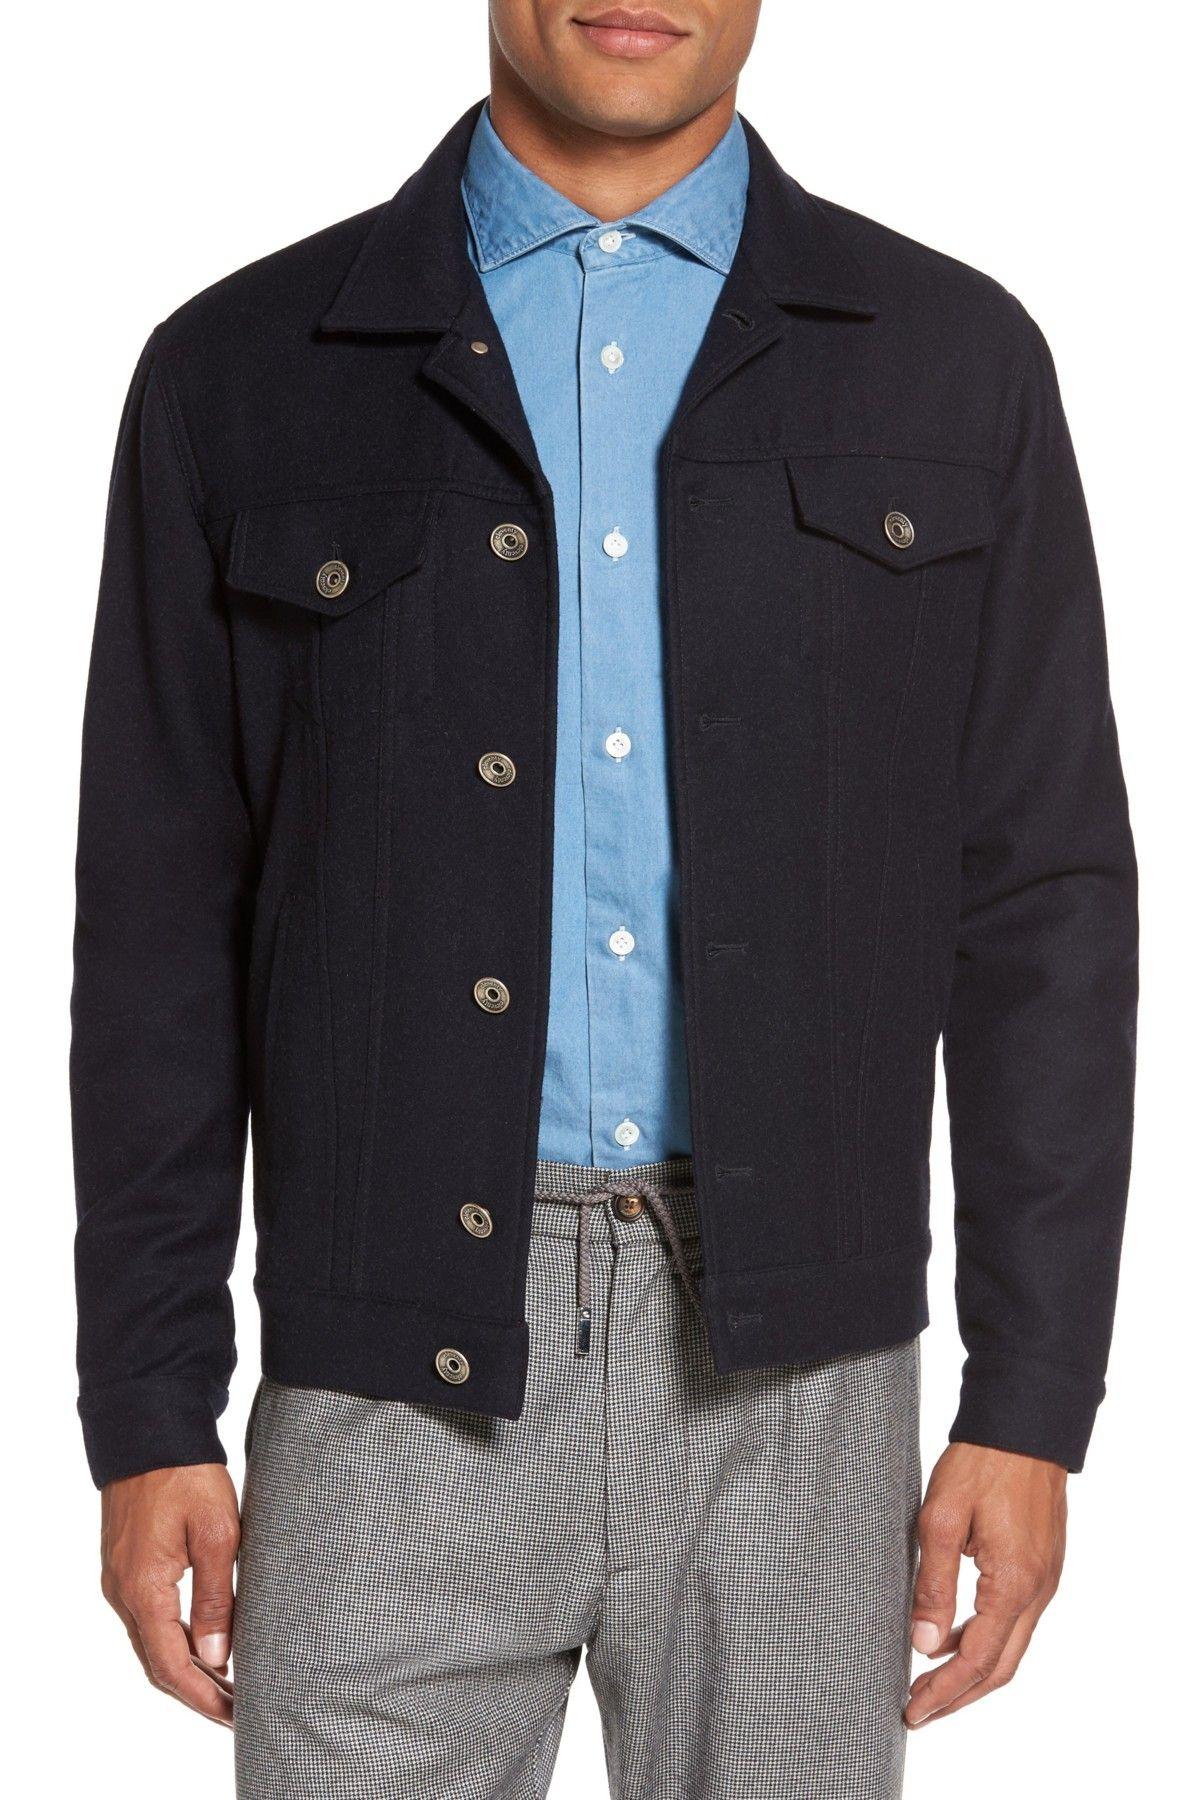 Wool cashmere flannel jacket  Eleventy Wool u Cashmere Flannel Trucker Jacket  Products